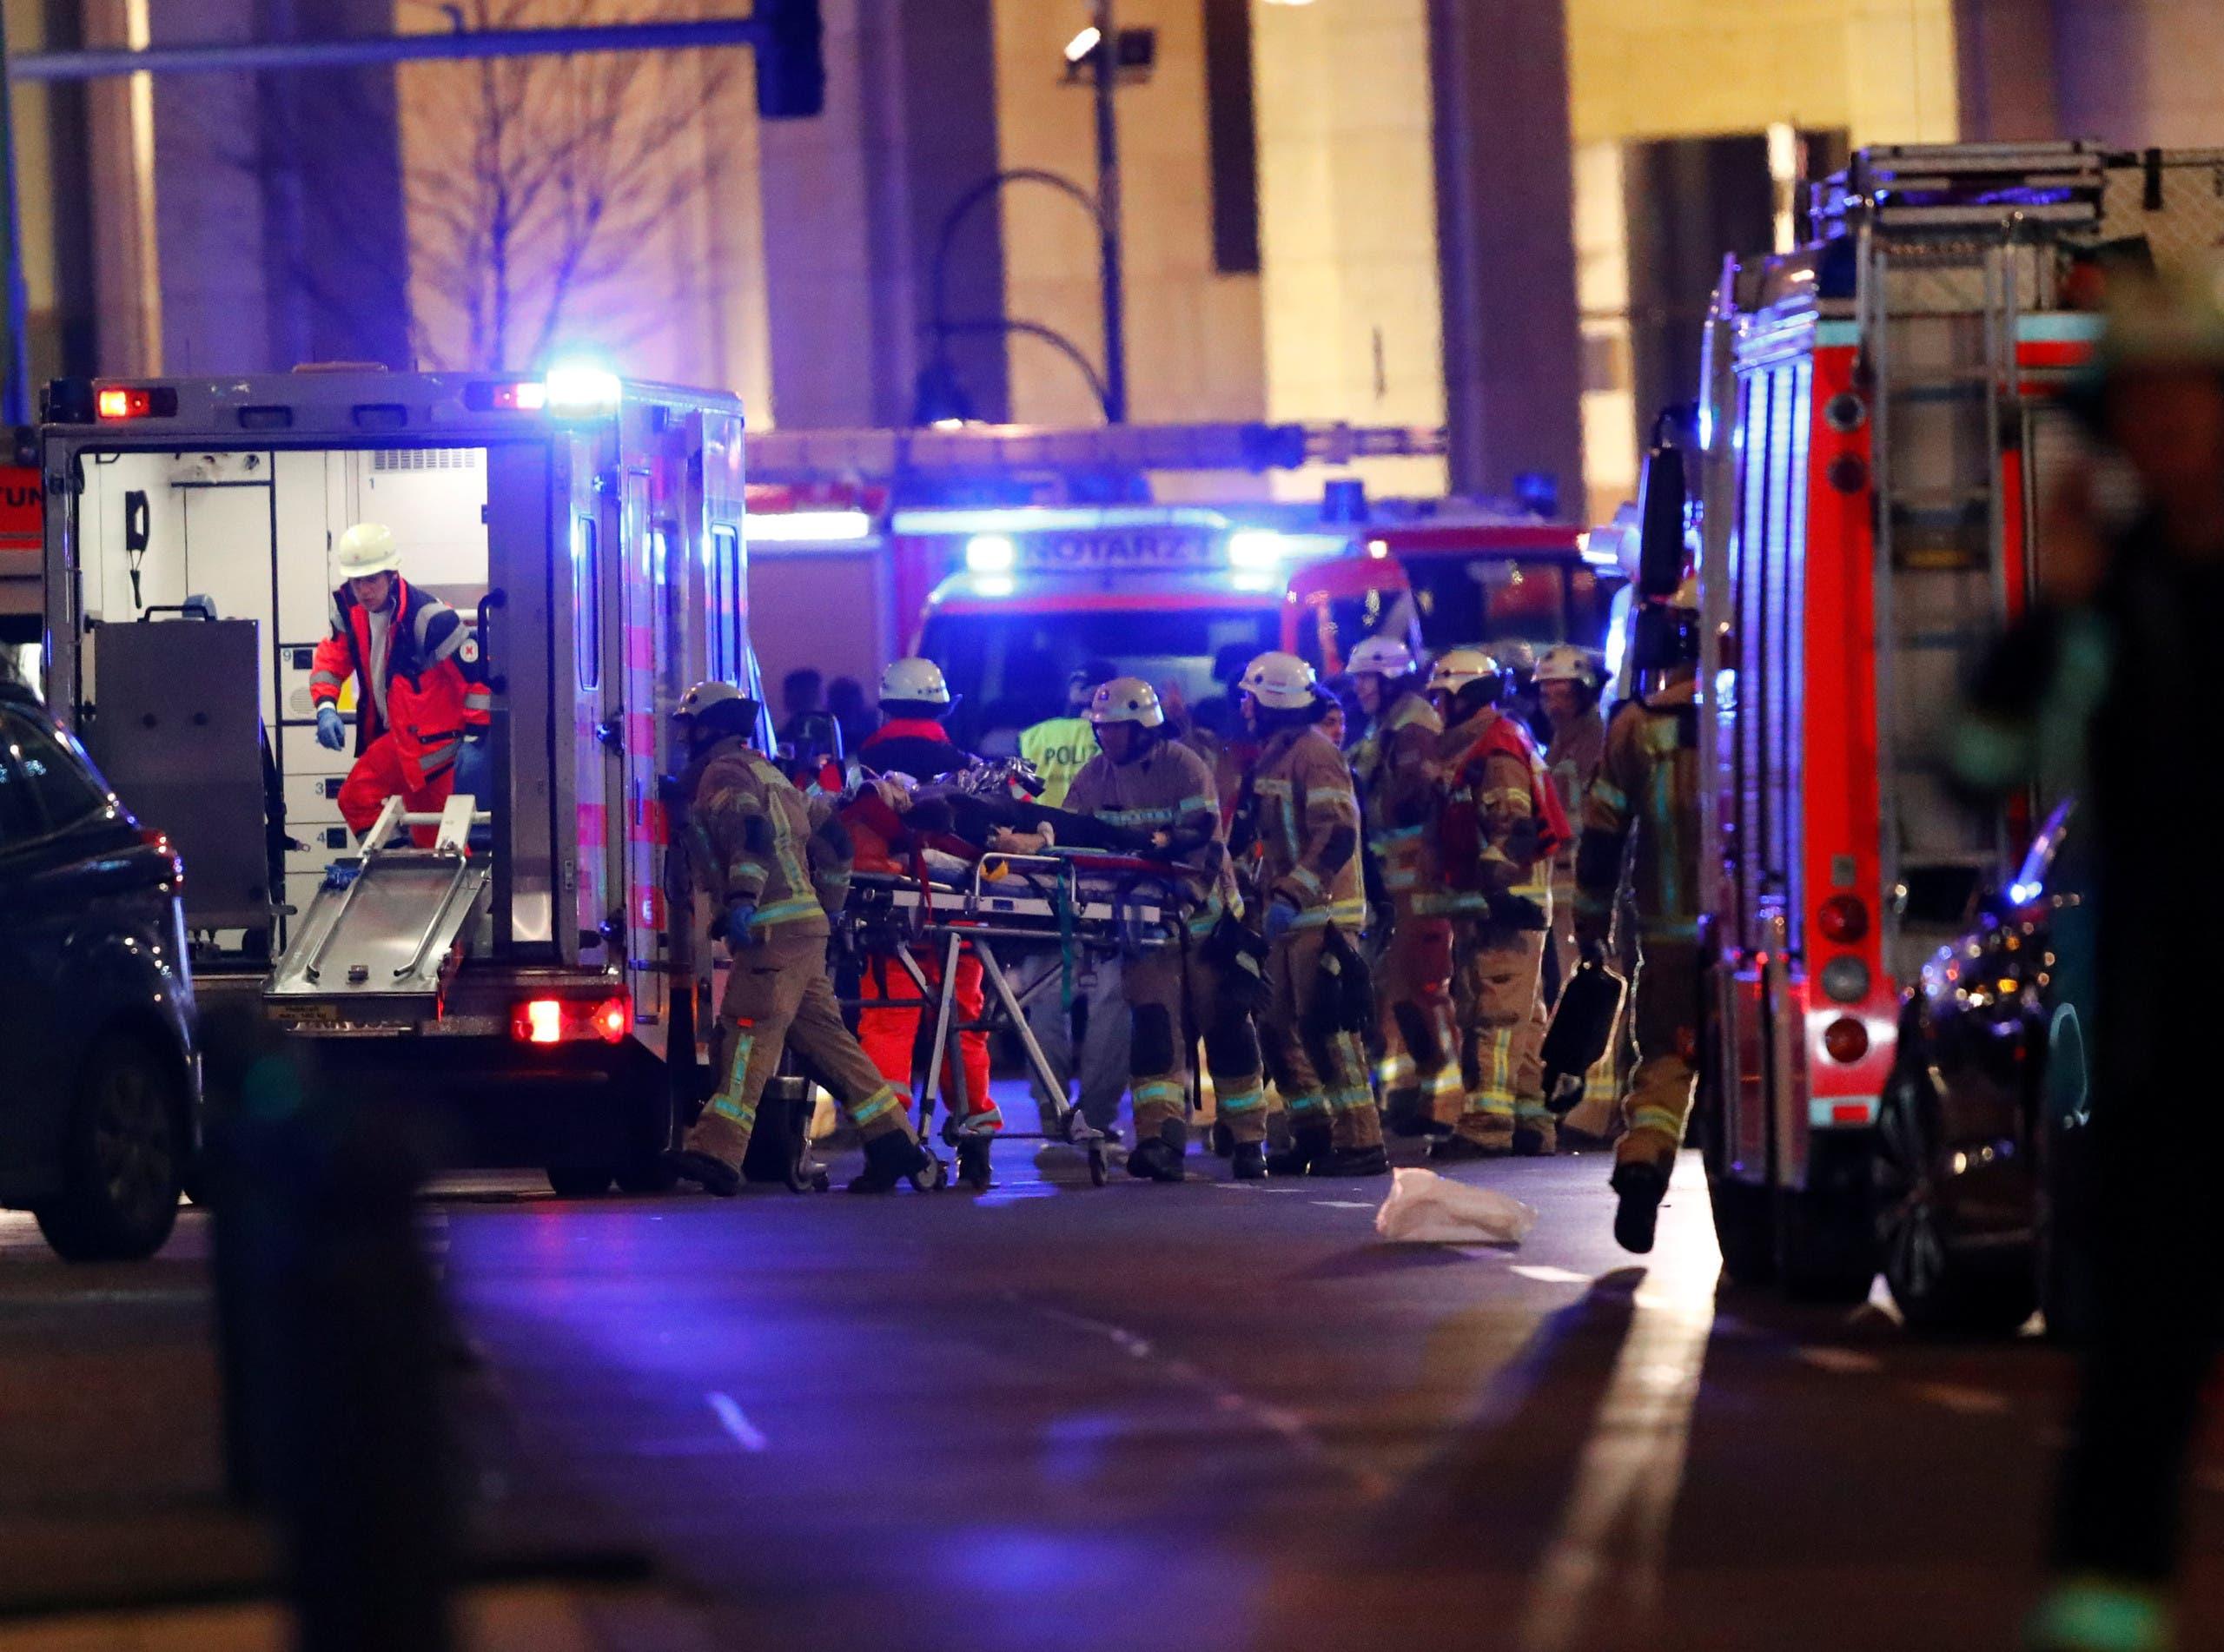 ISIS claims deadly Berlin Christmas market attack - Al Arabiya English